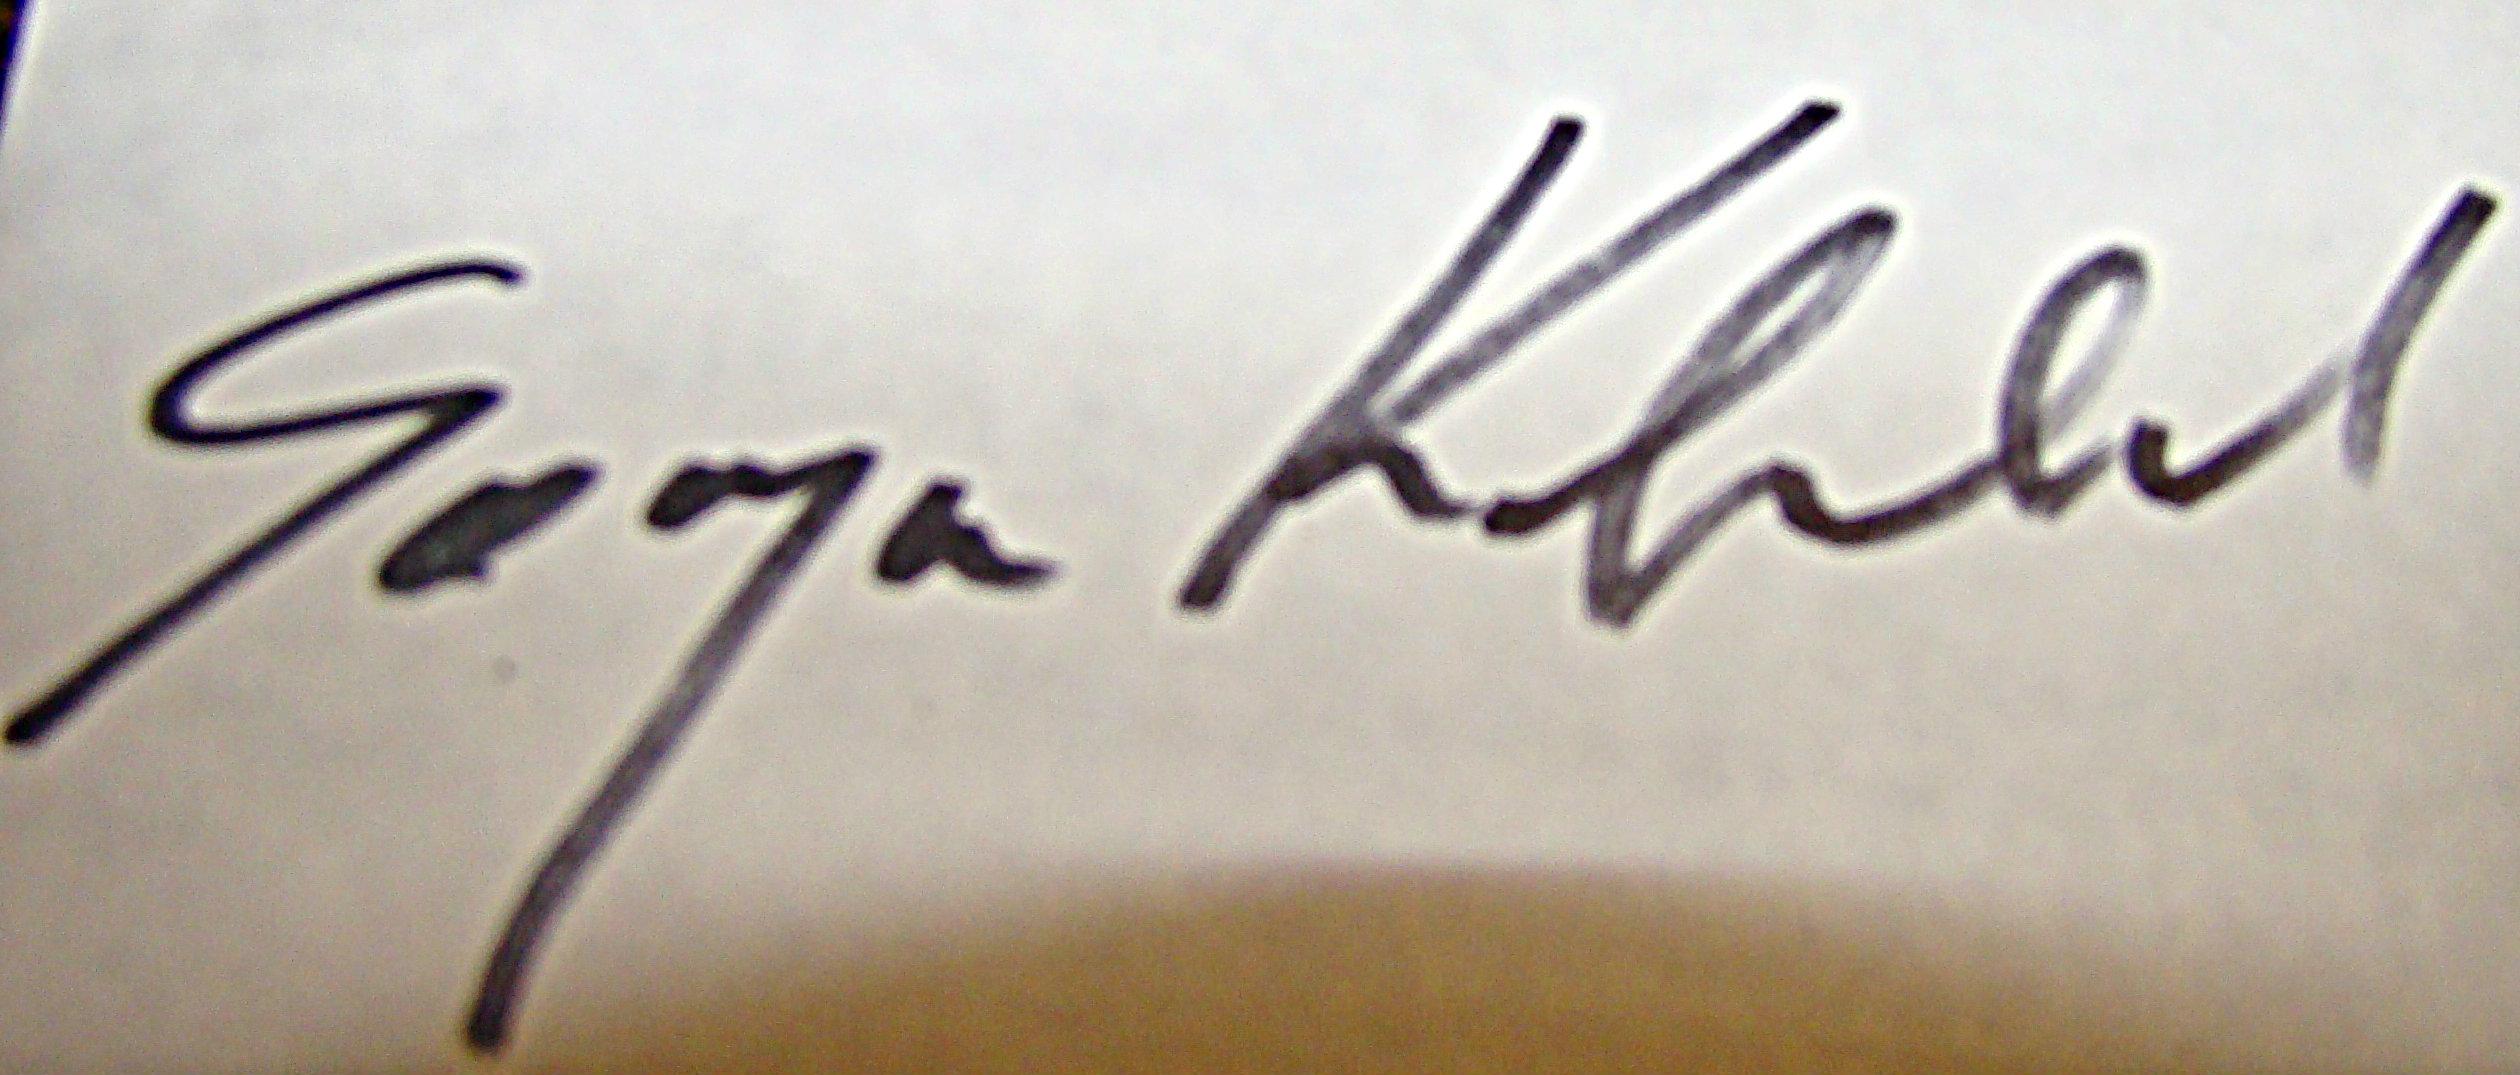 Sonja Kobrehel's Signature